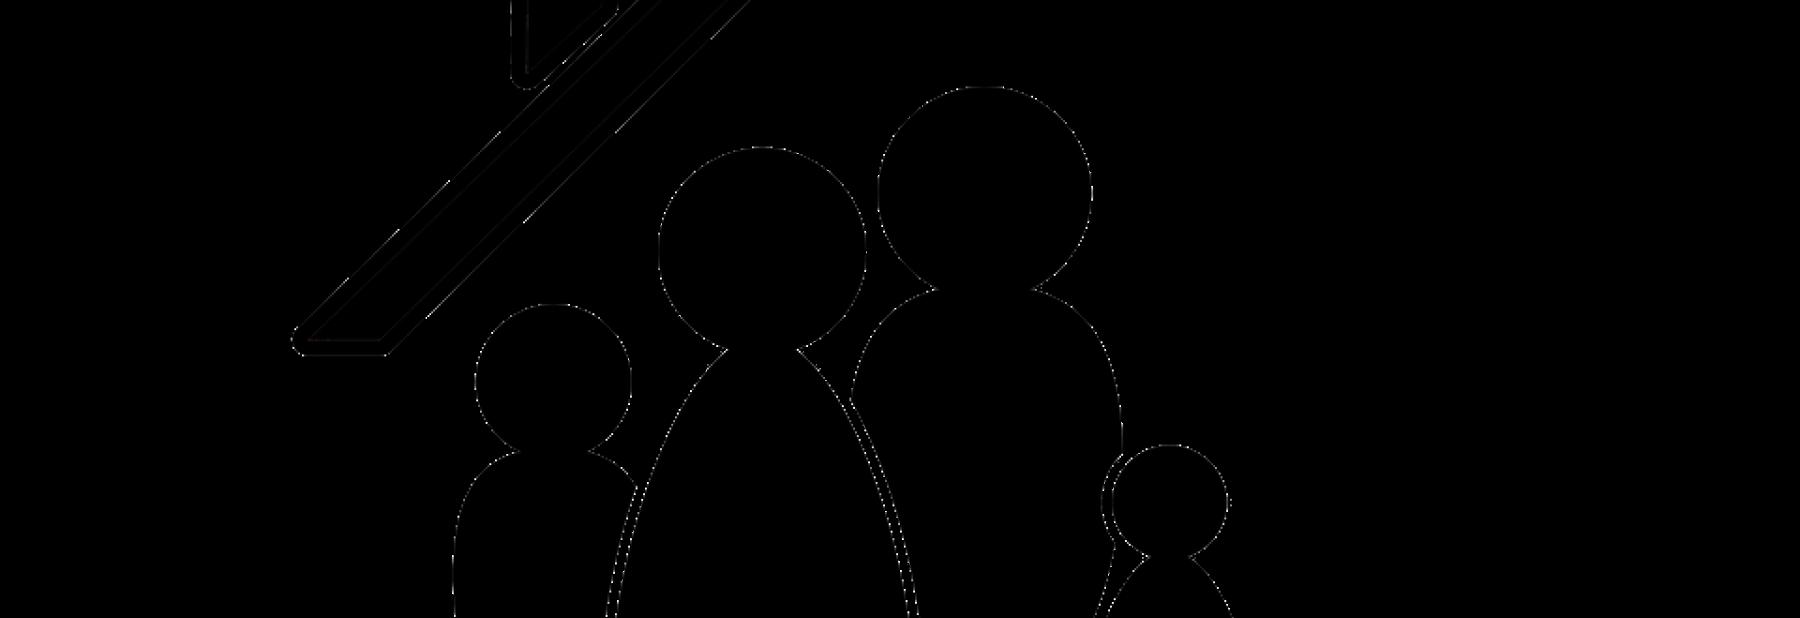 family-2057307_960_720